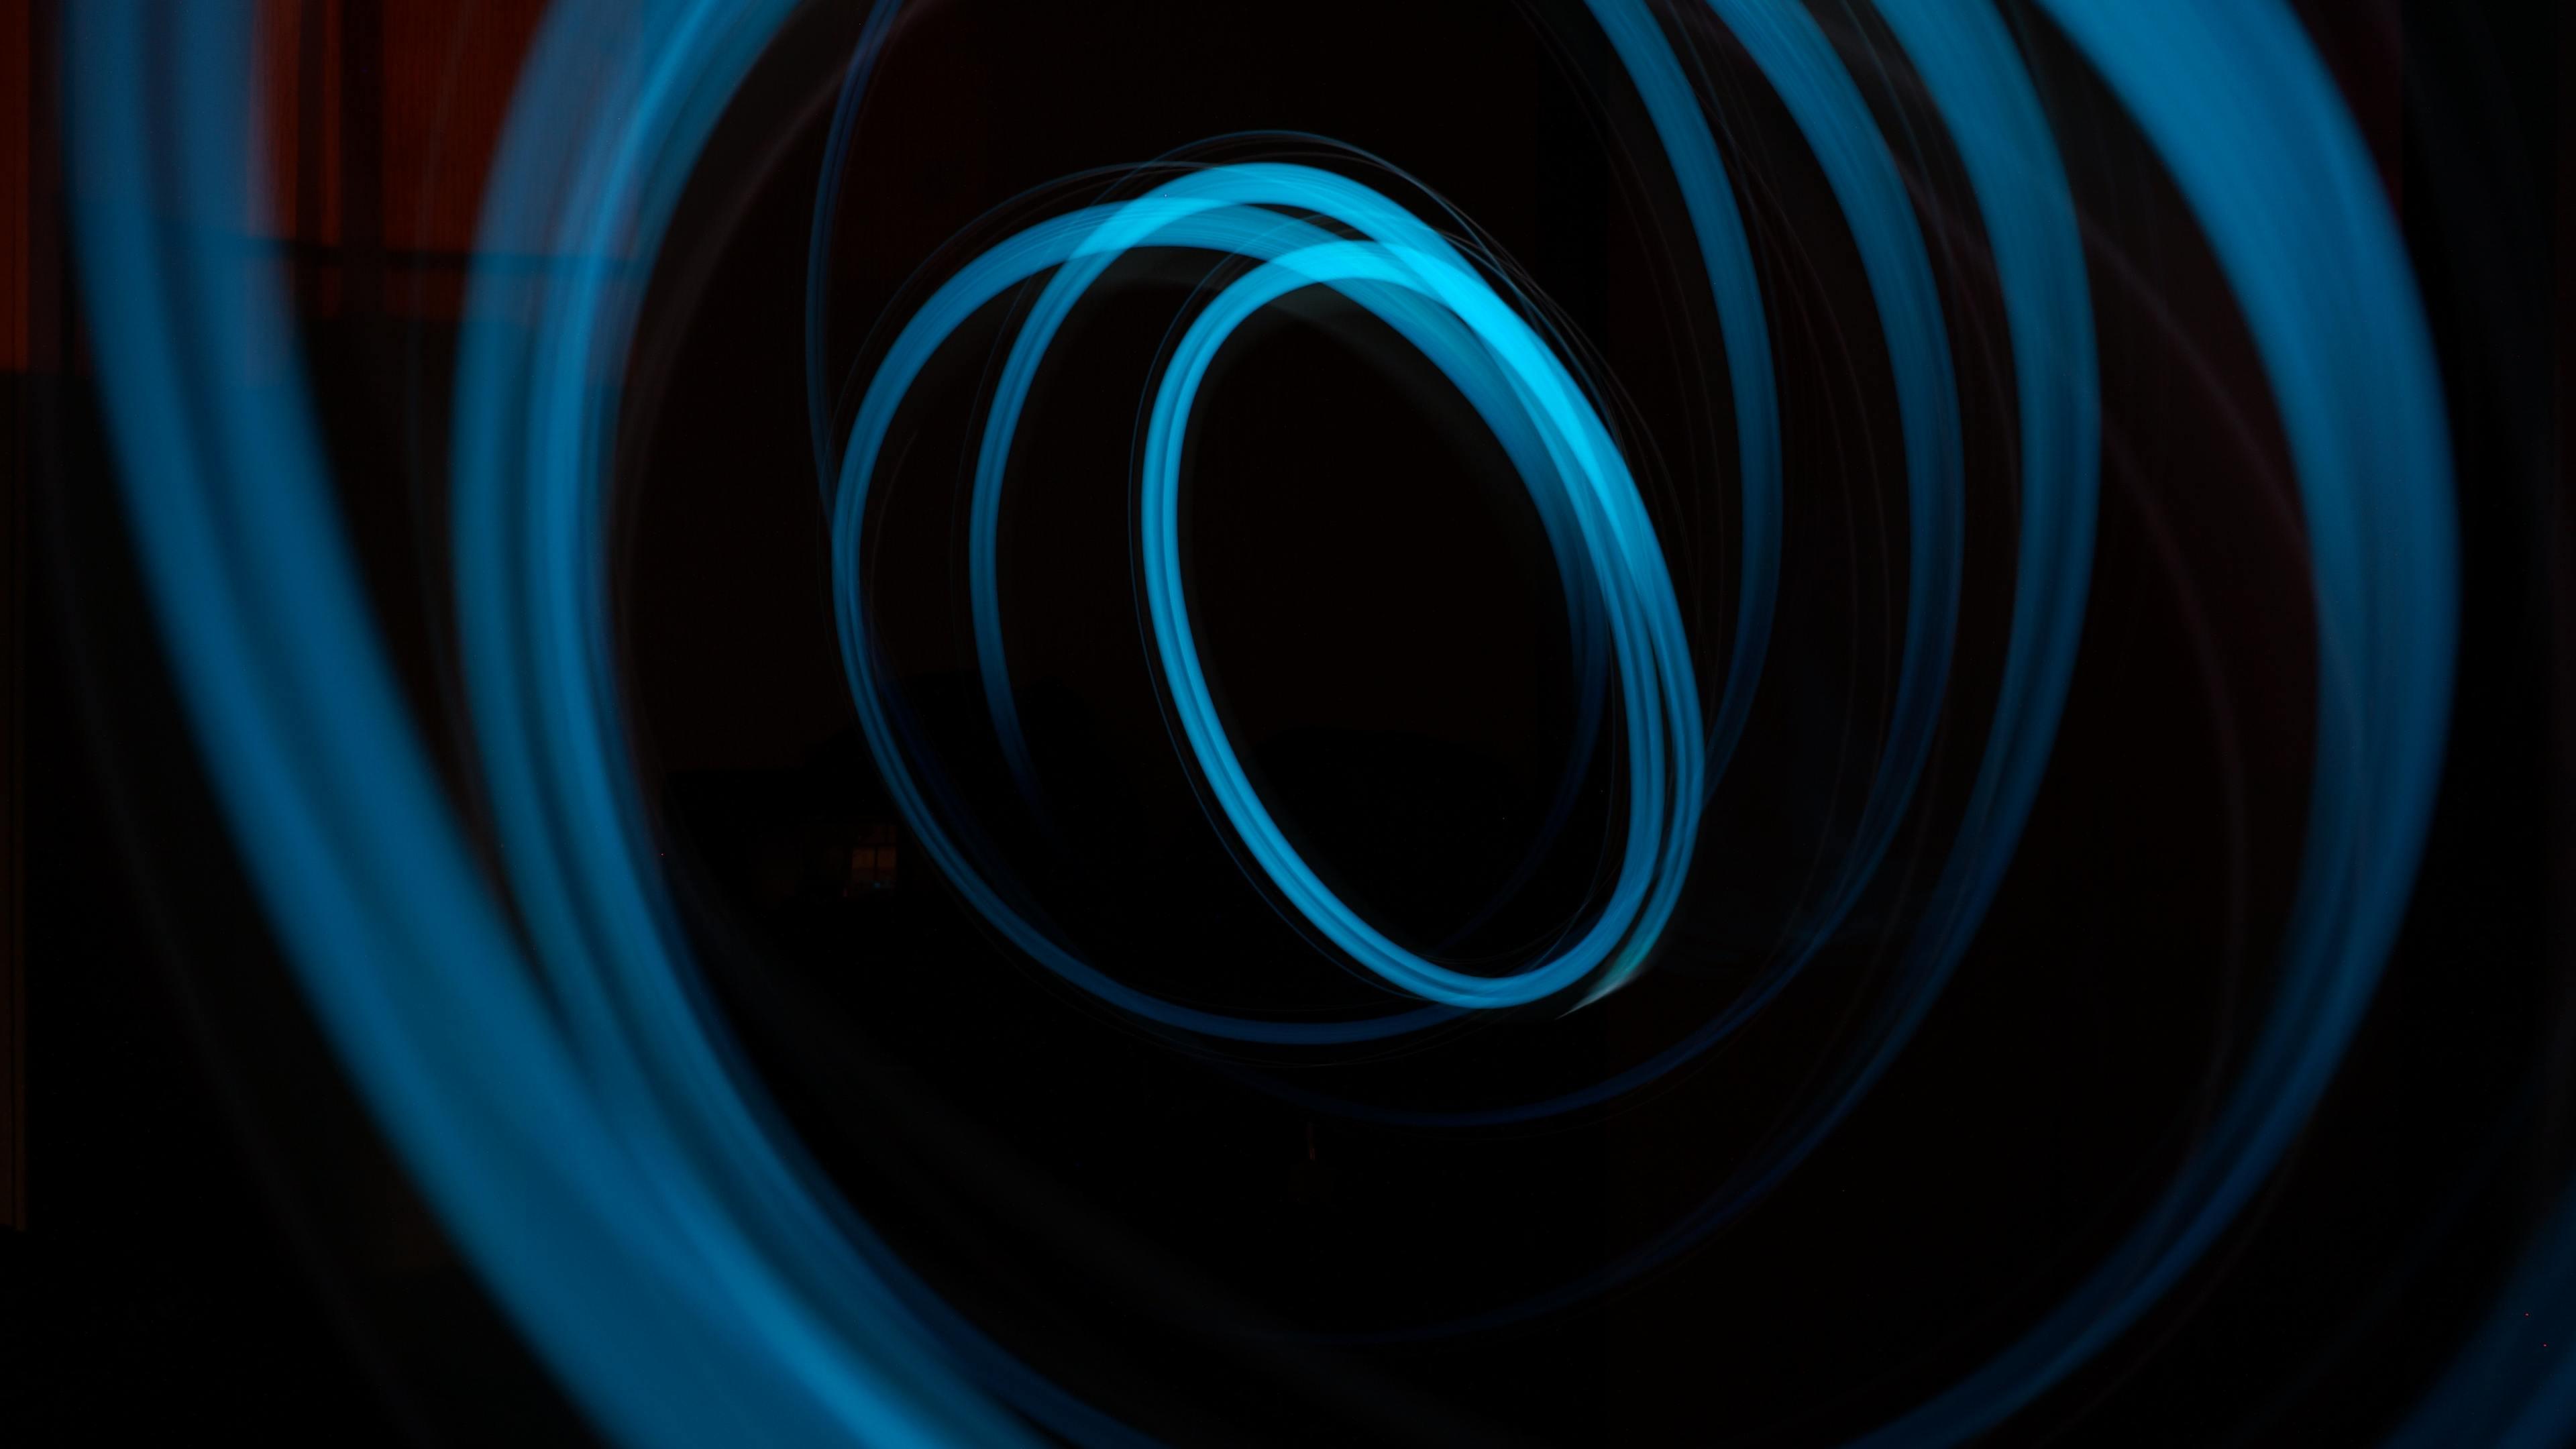 abstract art blue dark lights lines 4k 1553075403 - Abstract Art Blue Dark Lights Lines 4k - lines wallpapers, hd-wallpapers, digital art wallpapers, abstract wallpapers, 5k wallpapers, 4k-wallpapers